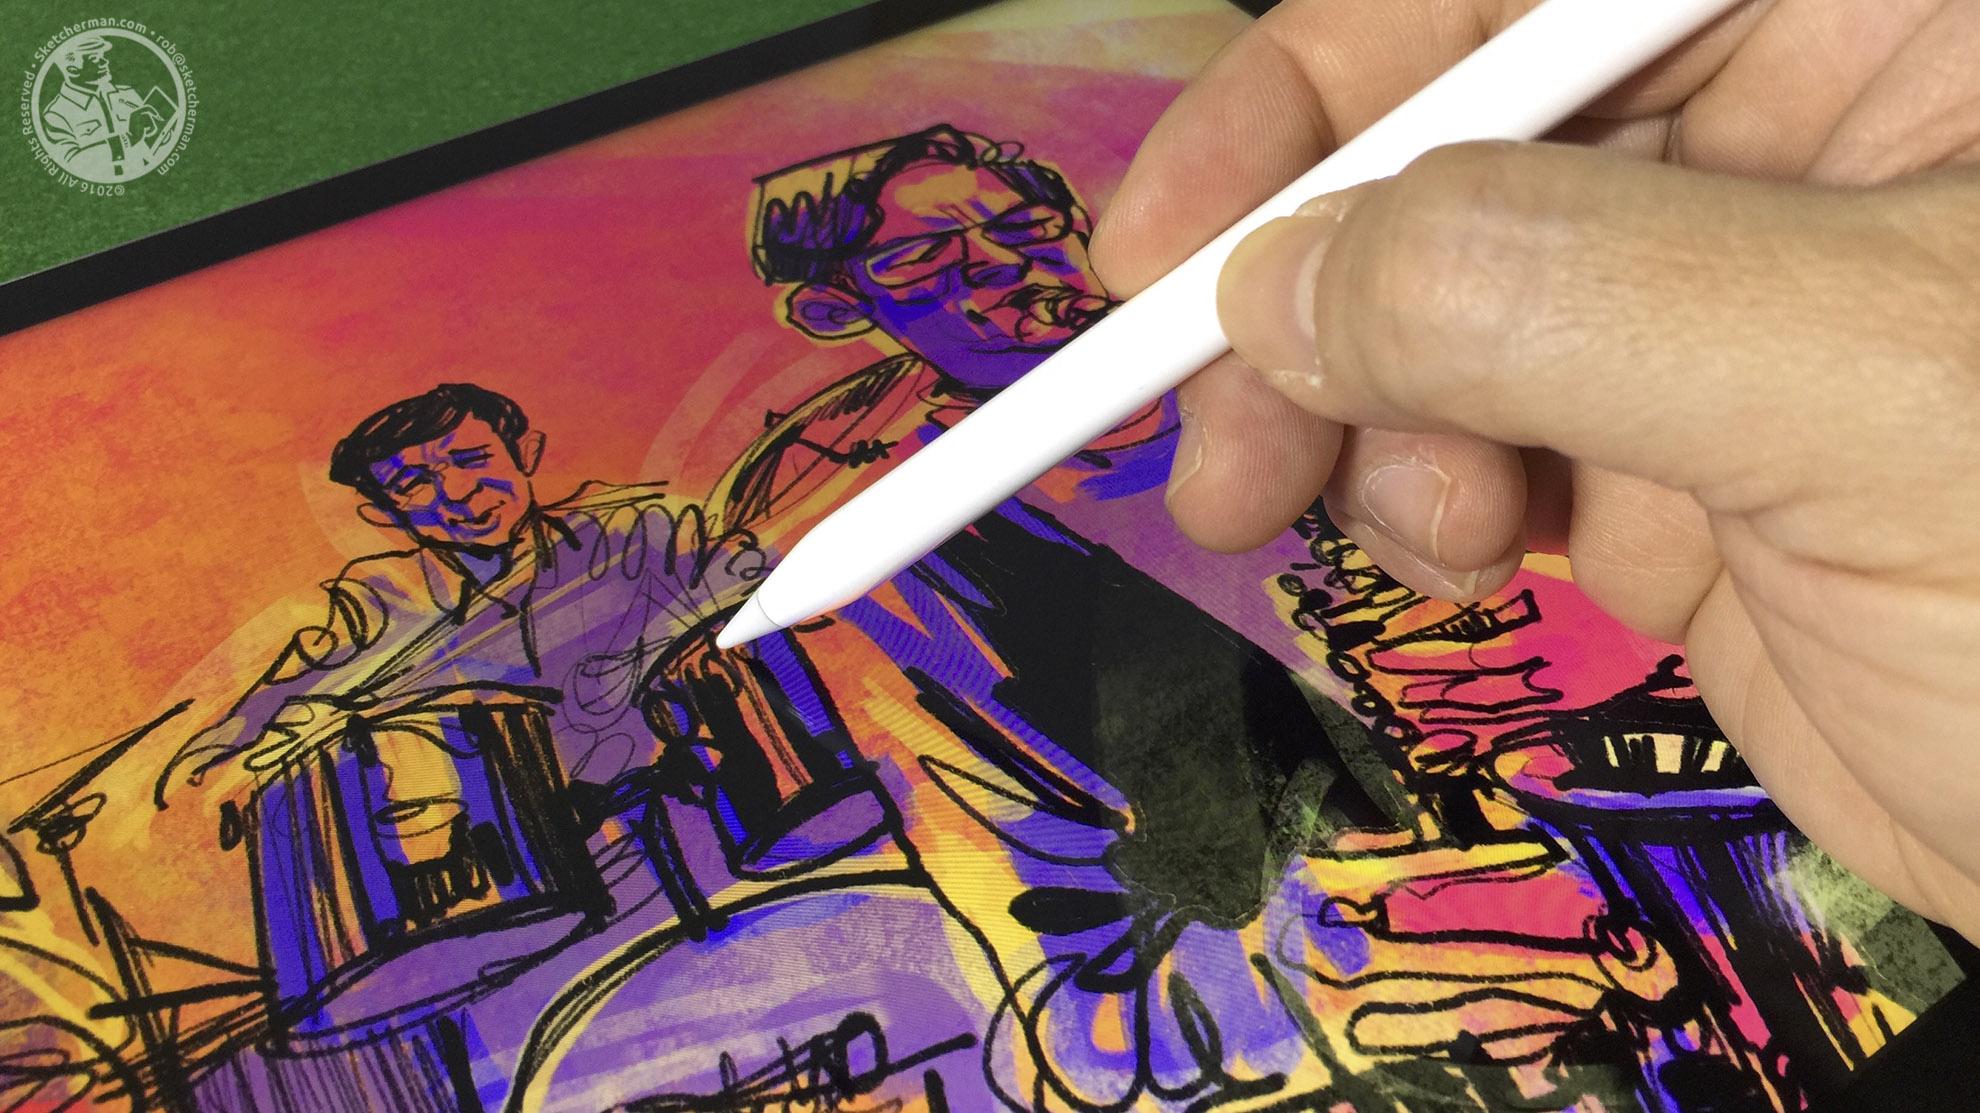 Urban sketching on iPad Pro with Apple Pencil-Sketcherman.jpg